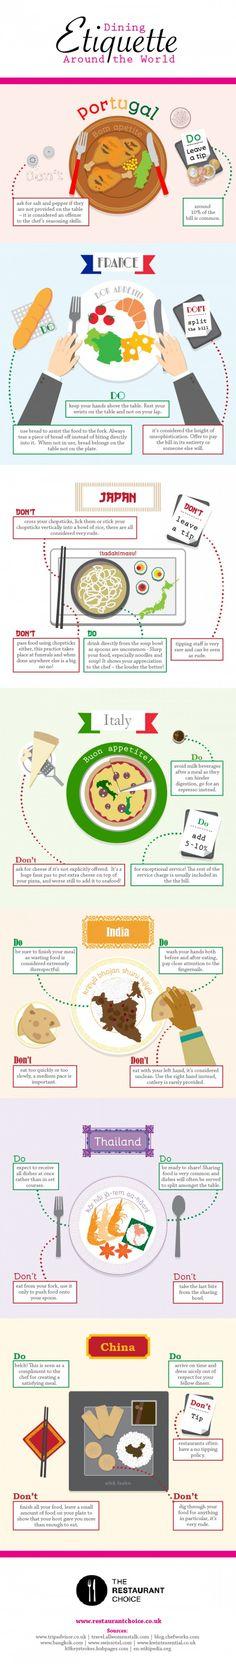 infographic-world-di...